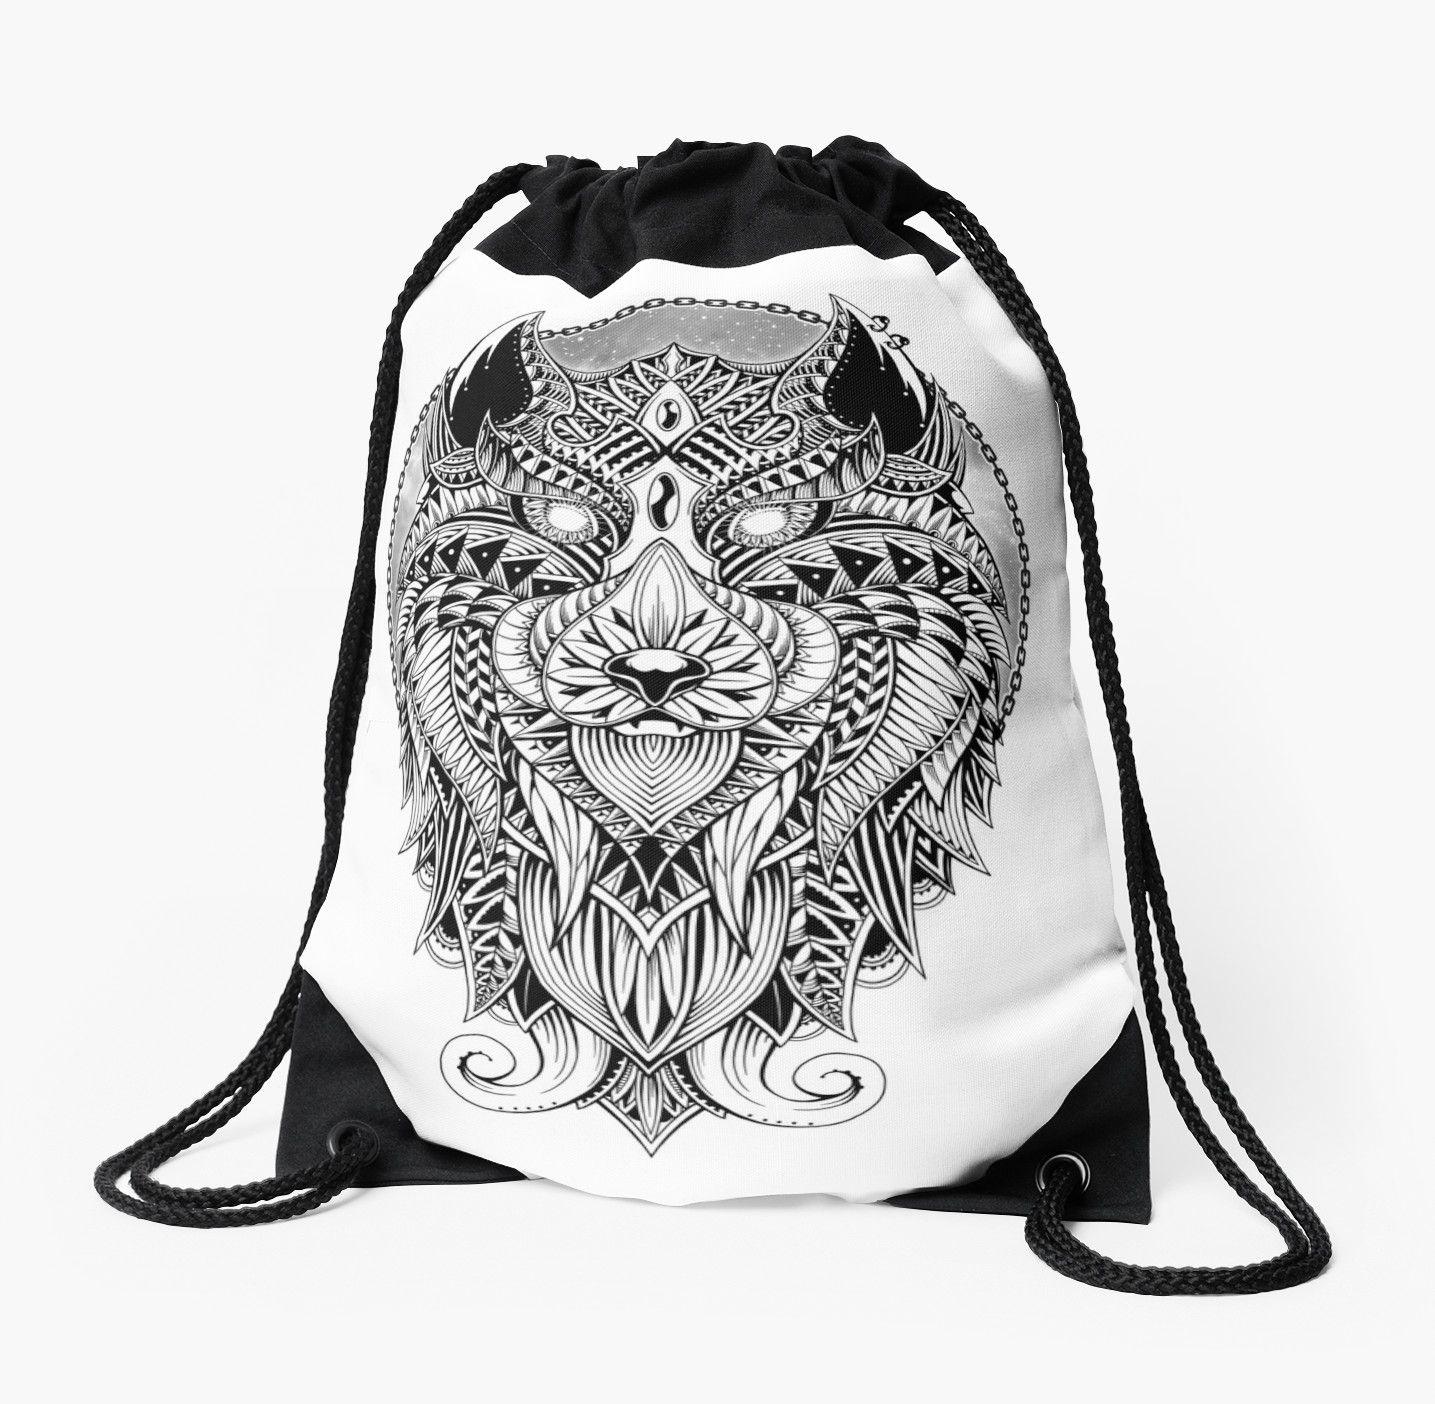 Drawstring Backpack Wild Horses Rucksack